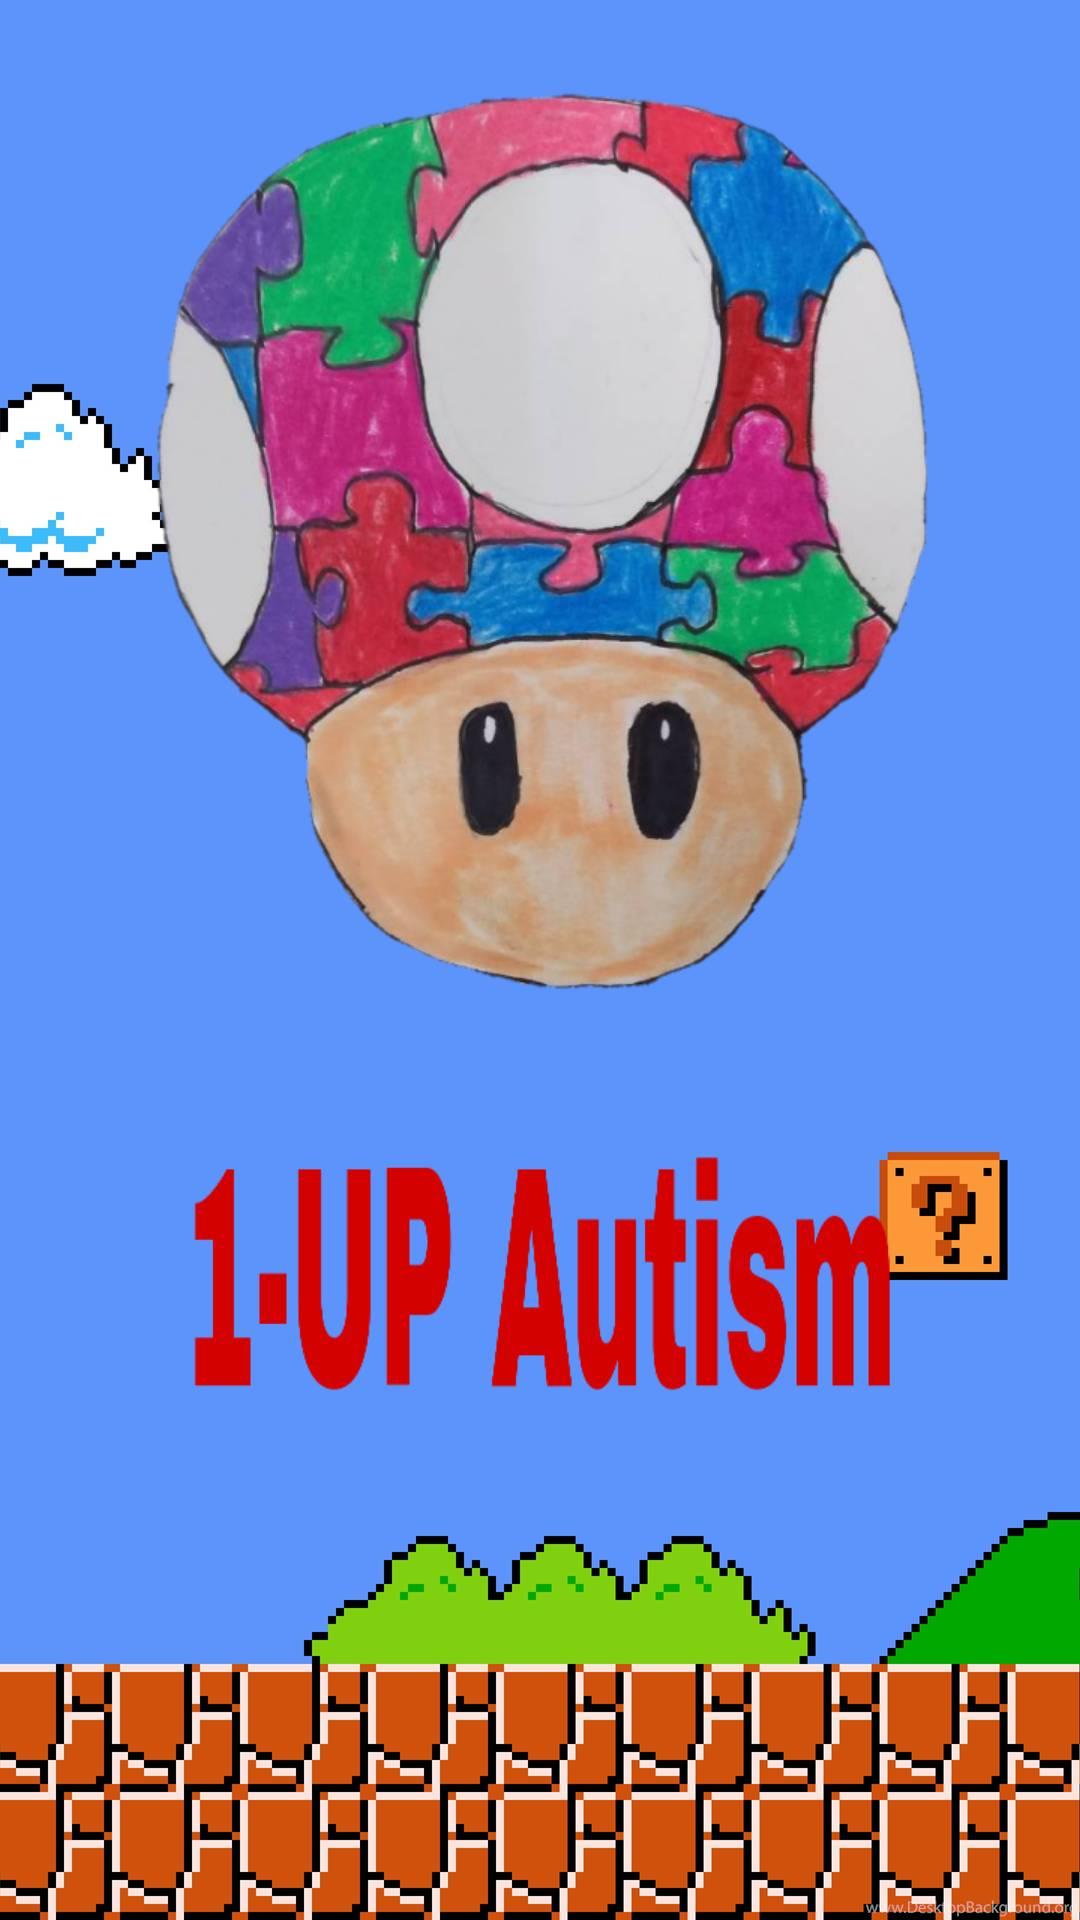 1 Up Autism Phone Wallpaper By Jon45030 On Deviantart